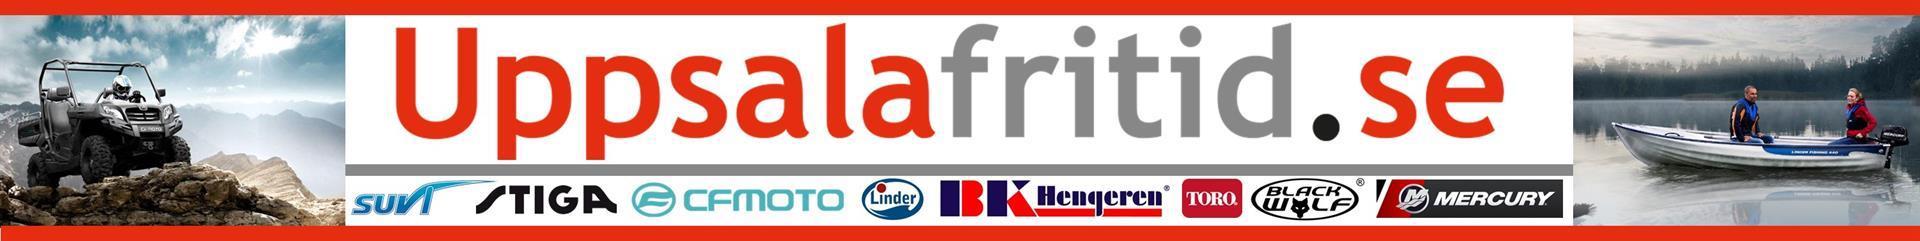 Uppsala Fritid - Banner